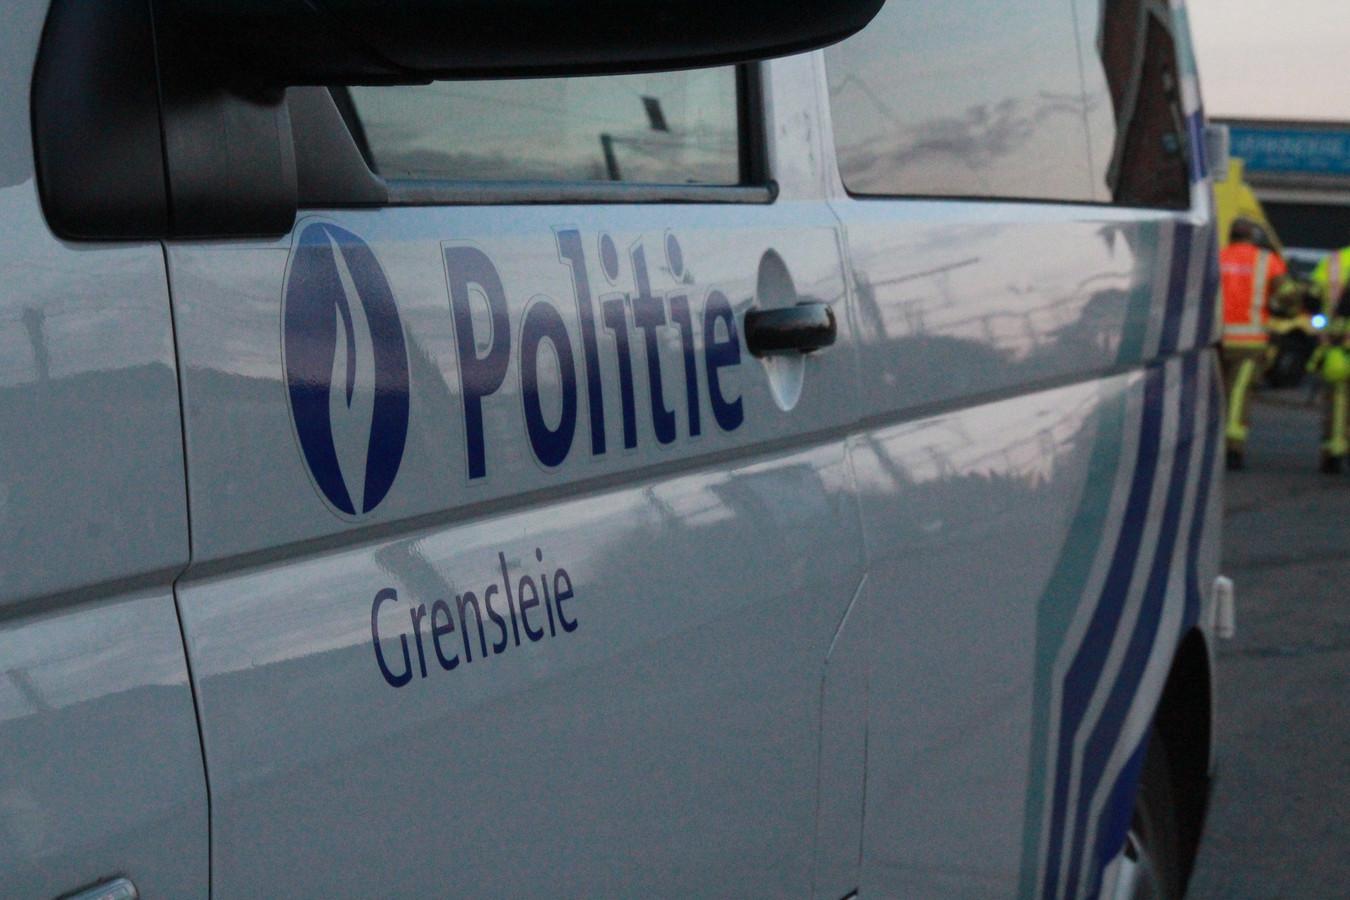 Politie Grensleie